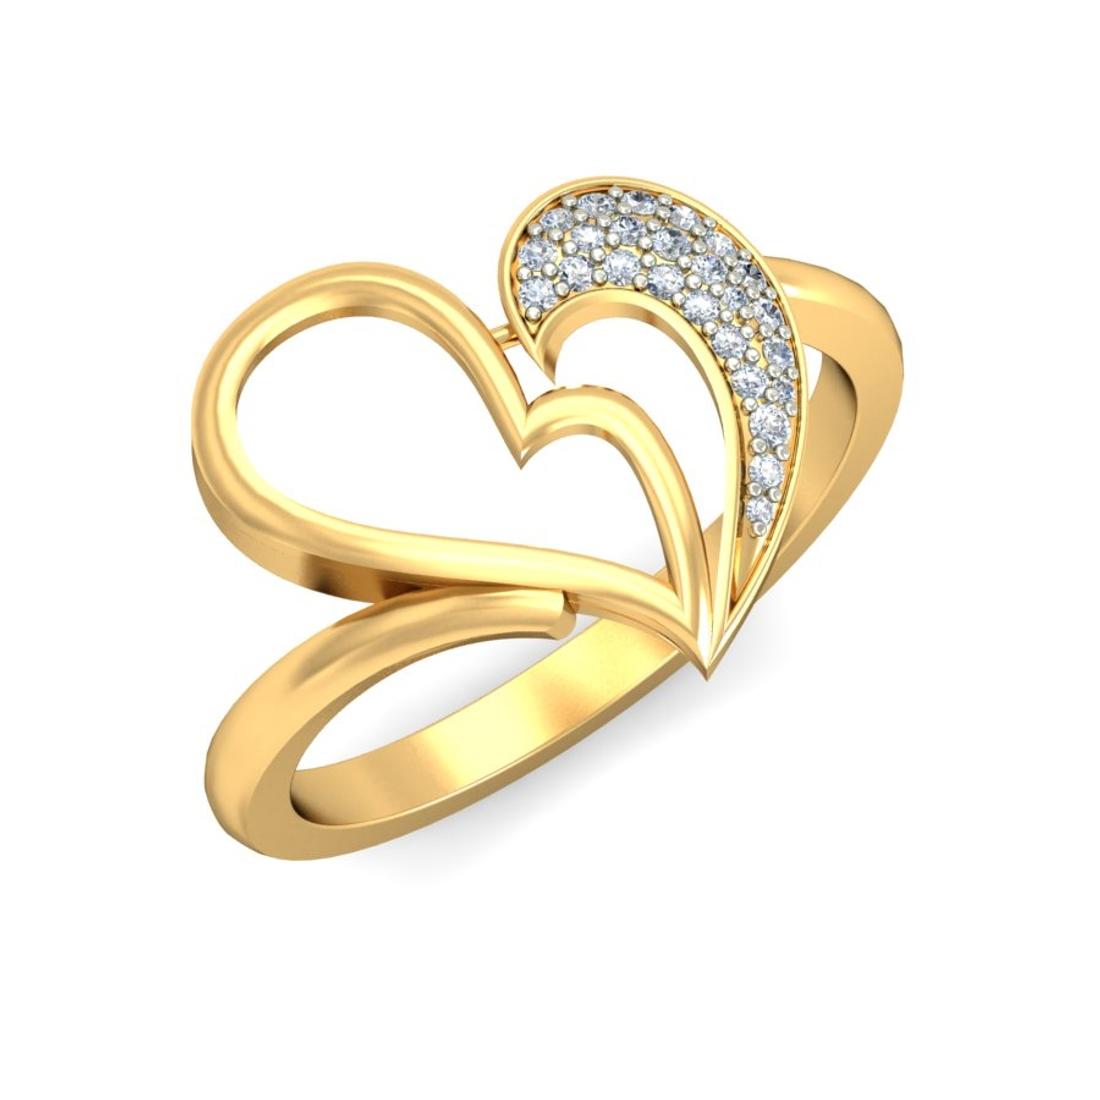 Ornomart's heart shaped Ring